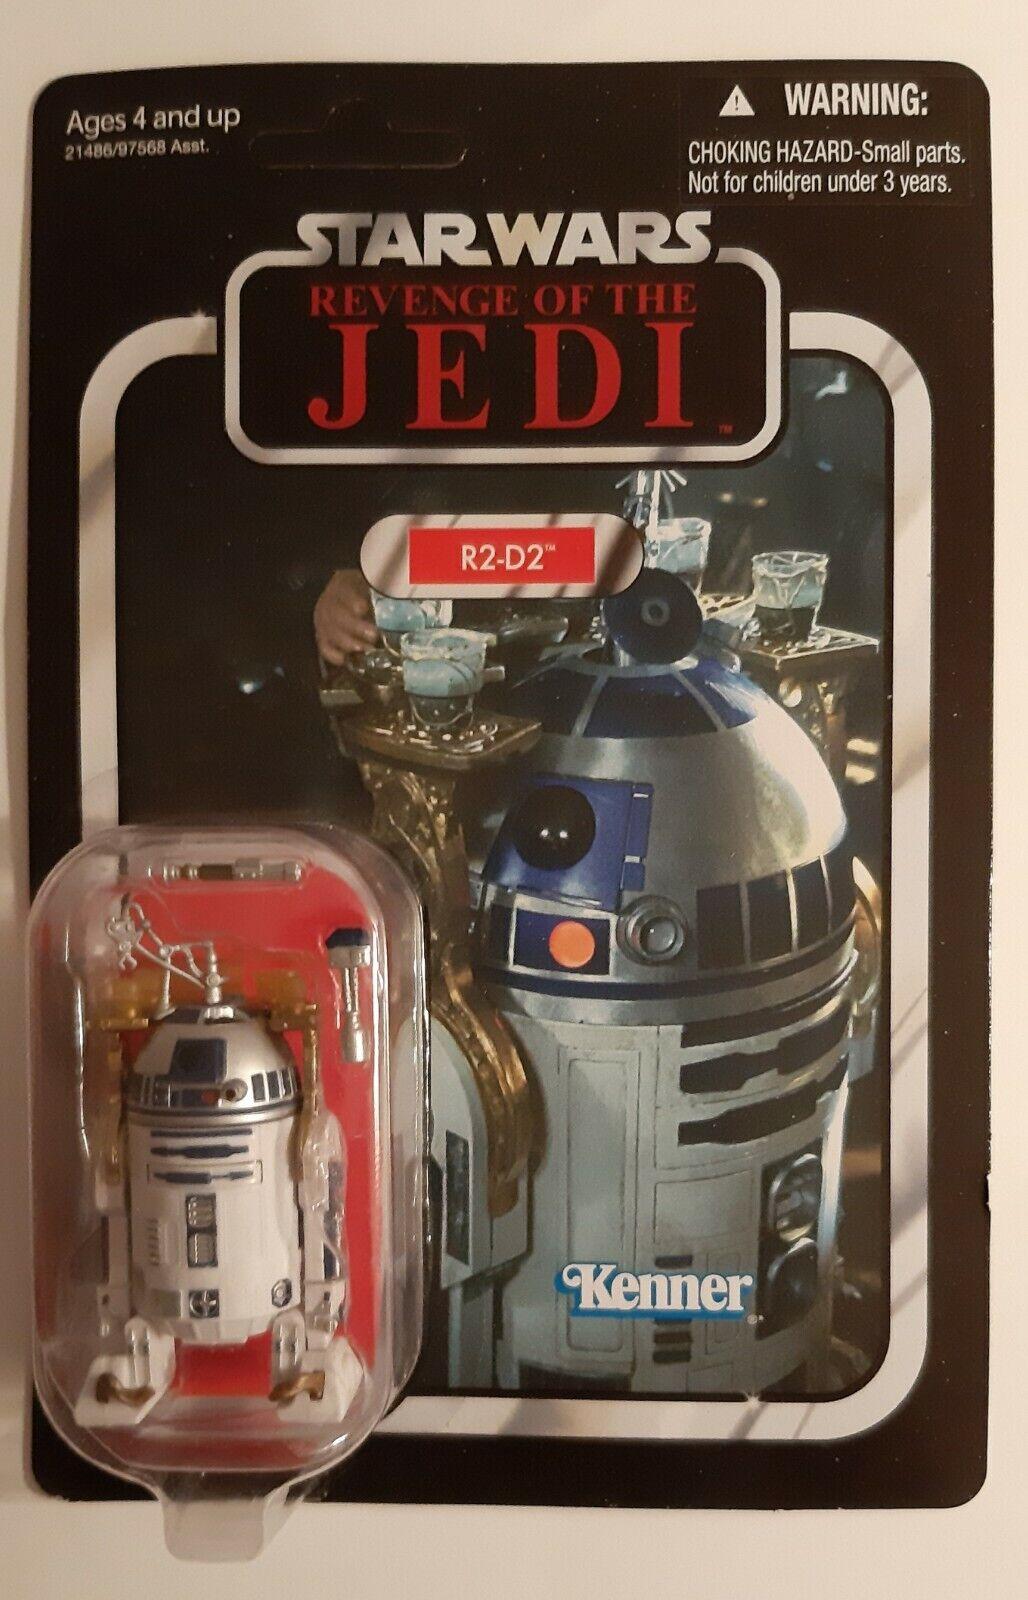 Star Wars Vintage Collection R2-D2 Revenge of the Jedi SDCC 2011 MOC vc25